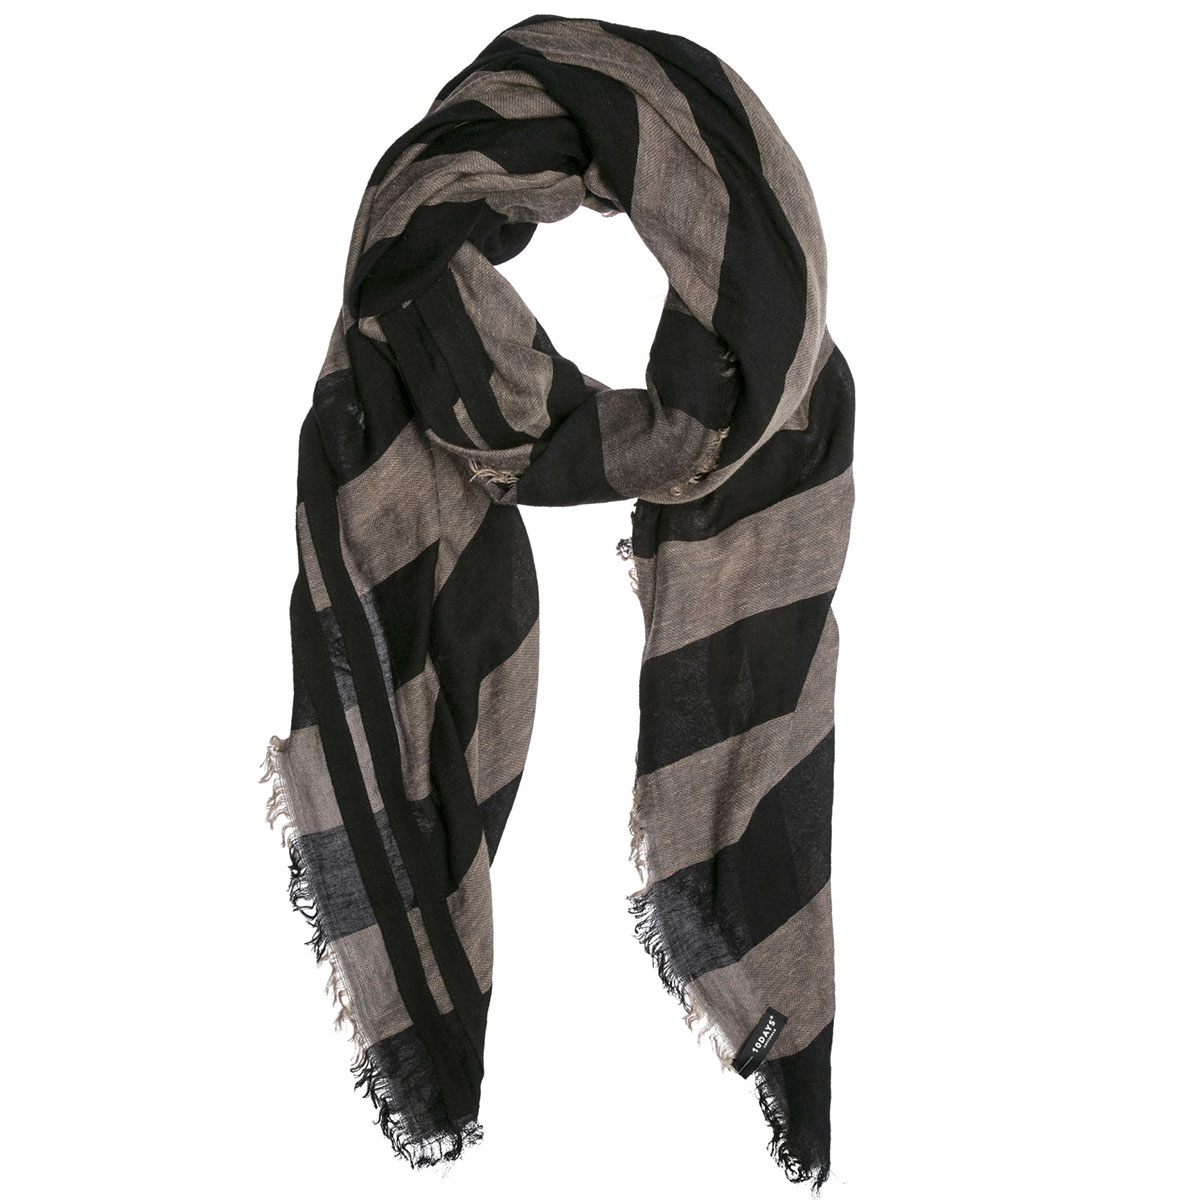 209259101 10 days sjaal charcoal